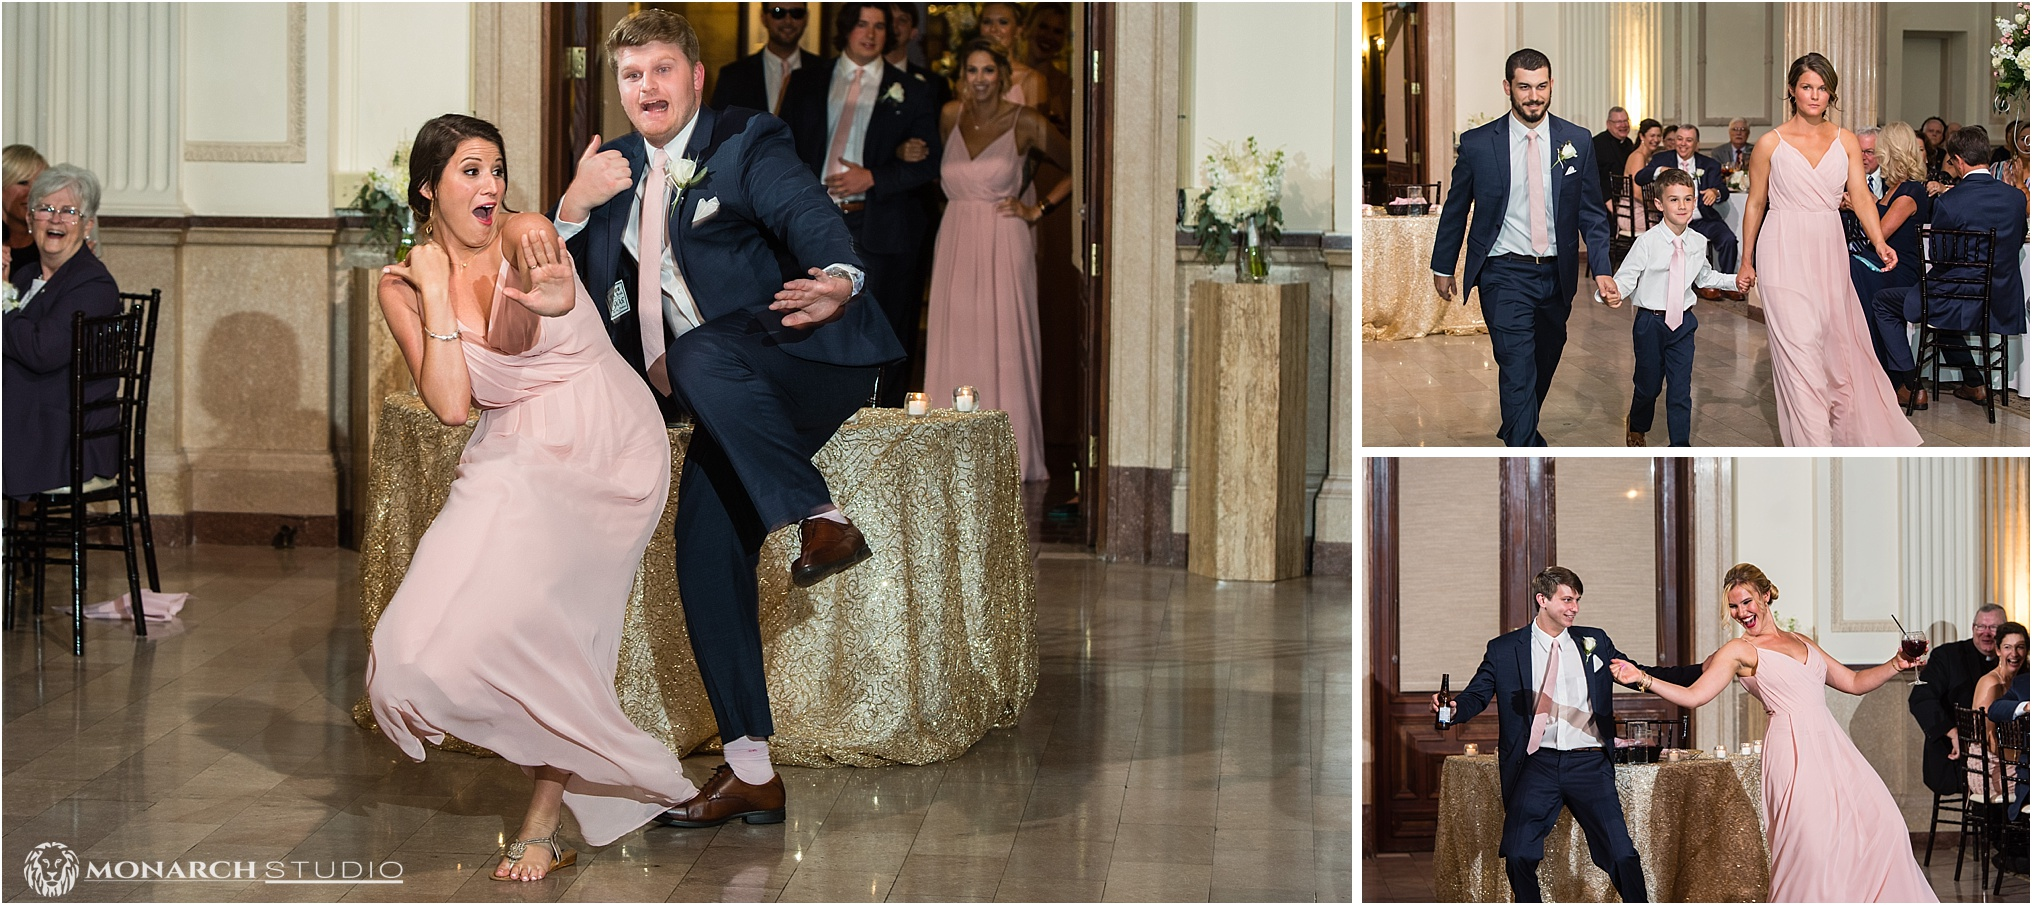 st-augustine-wedding-photographer-103.jpg